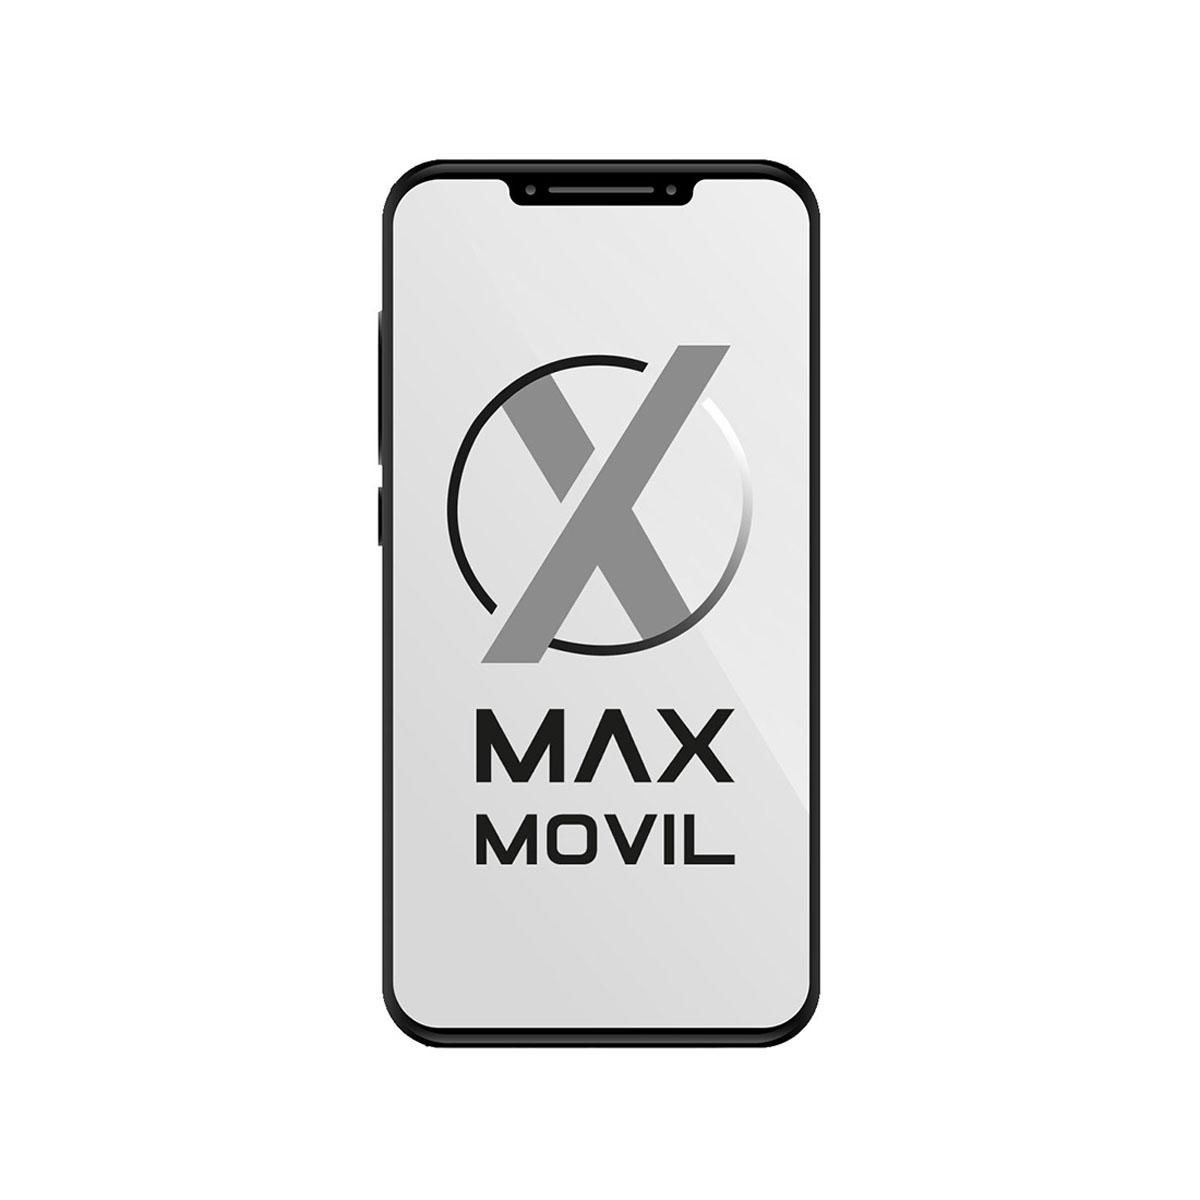 Telefono movil Iphone 6S Plus 128Gb space grey CPO ECORECICLADO GRADO A